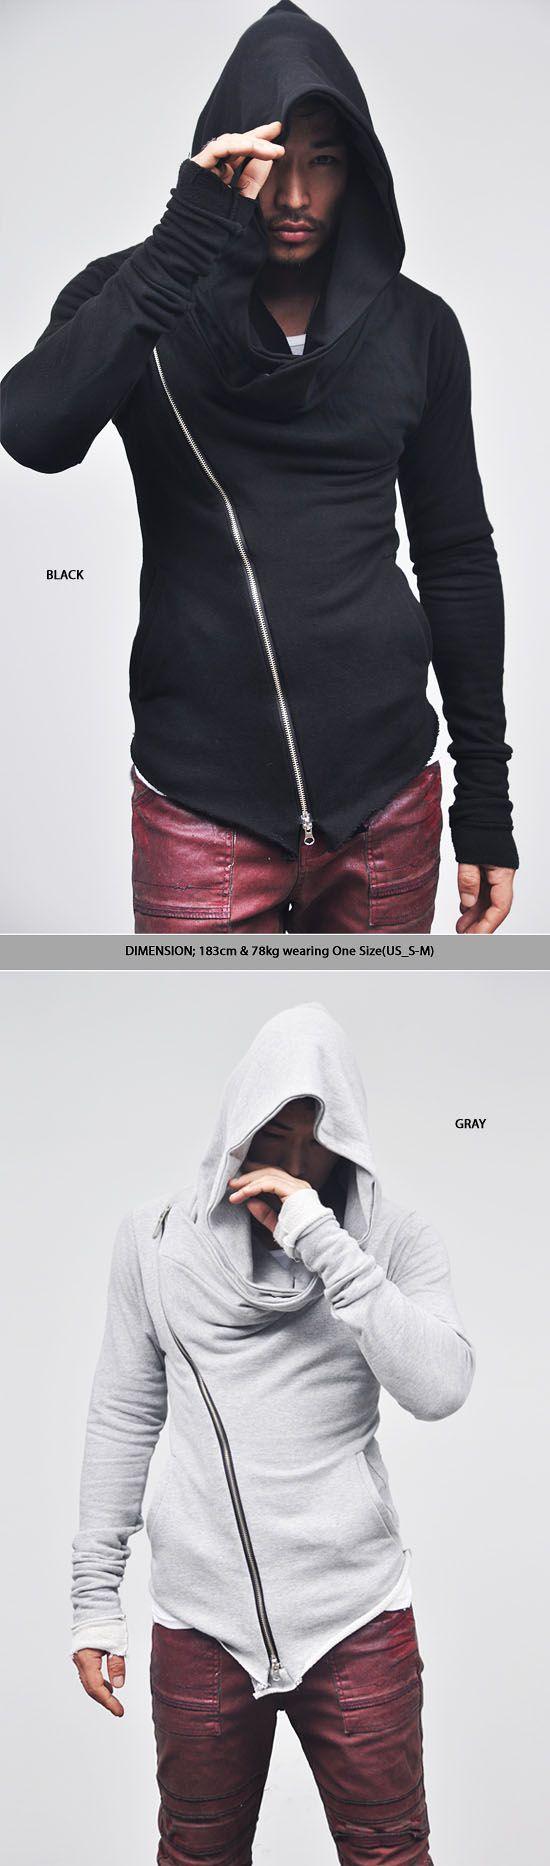 Tops :: Hoodies :: Re) Diabolic Dark Edge Turtle Zipup-Hoodie 21 - Mens Fashion Clothing For An Attractive Guy Look